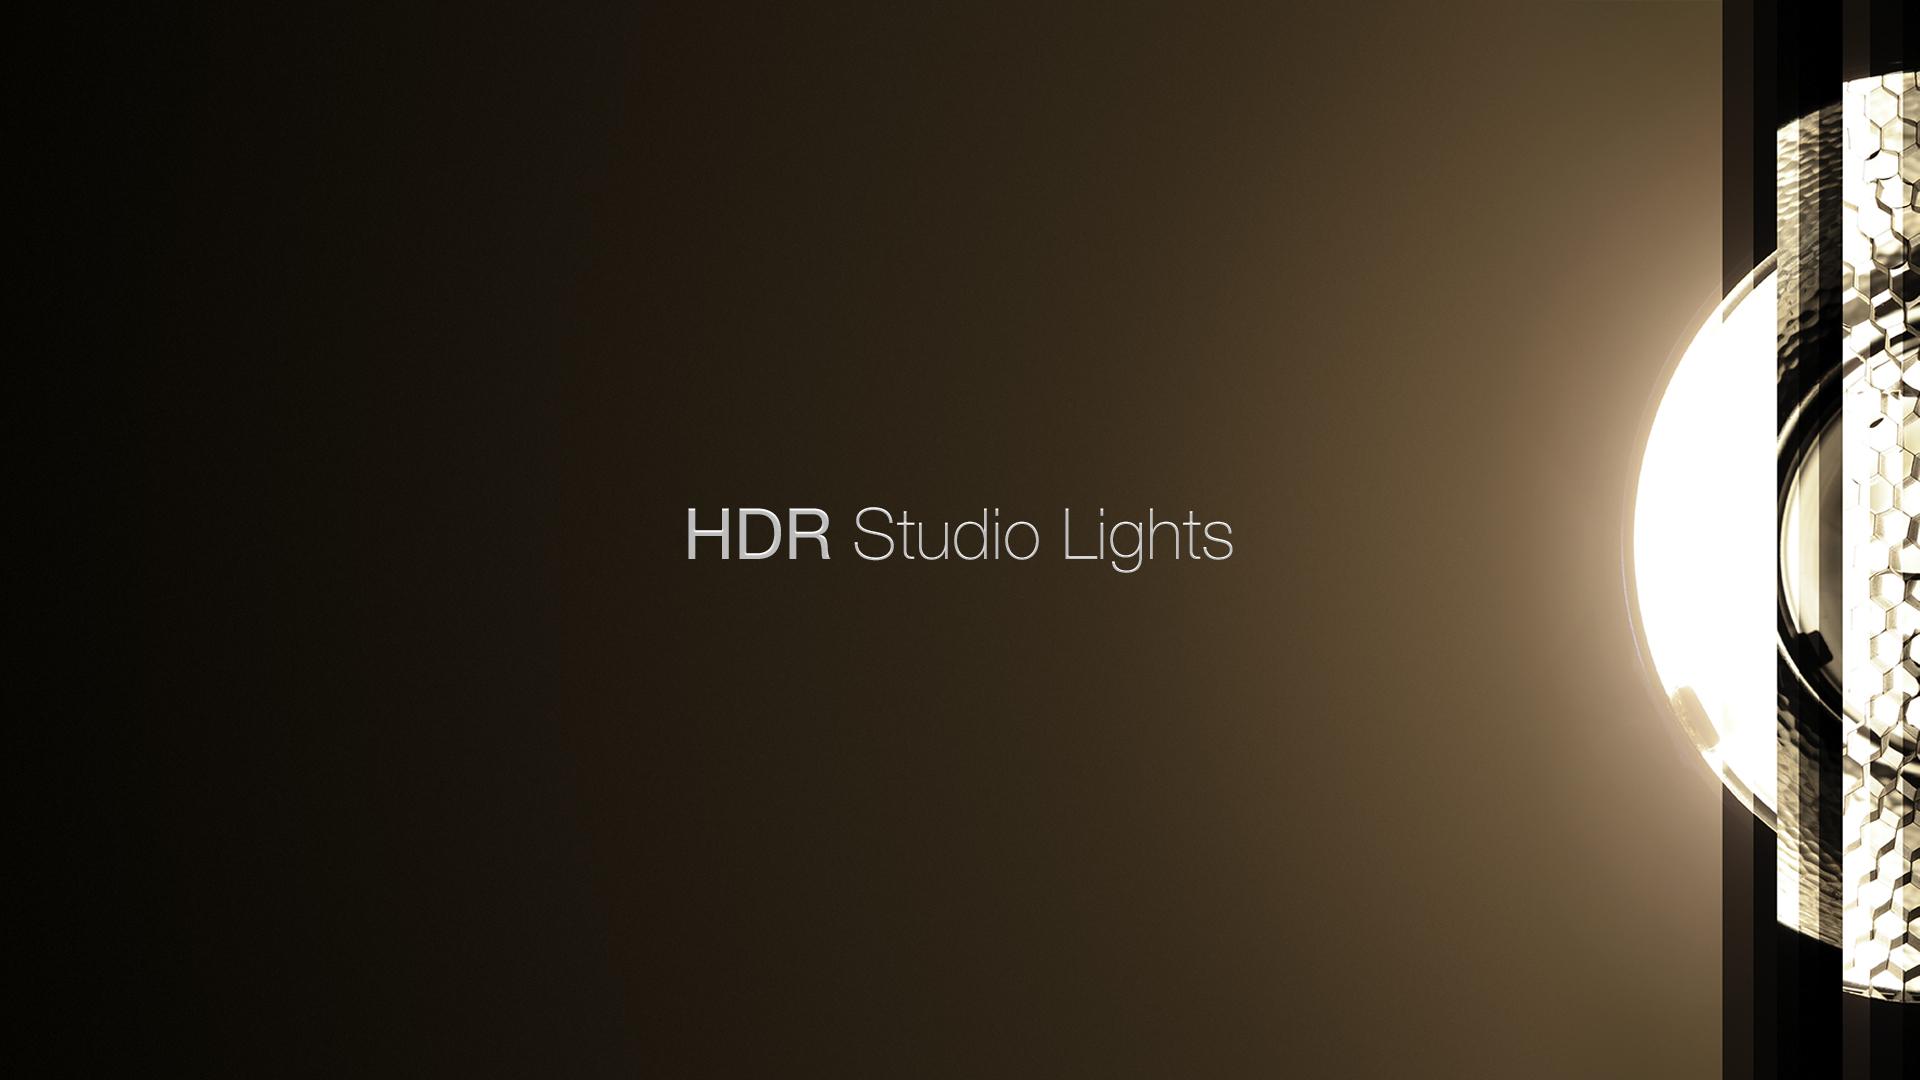 & HDR Studio Lights u2014 Pingo van der Brinkloev - VFX artist azcodes.com